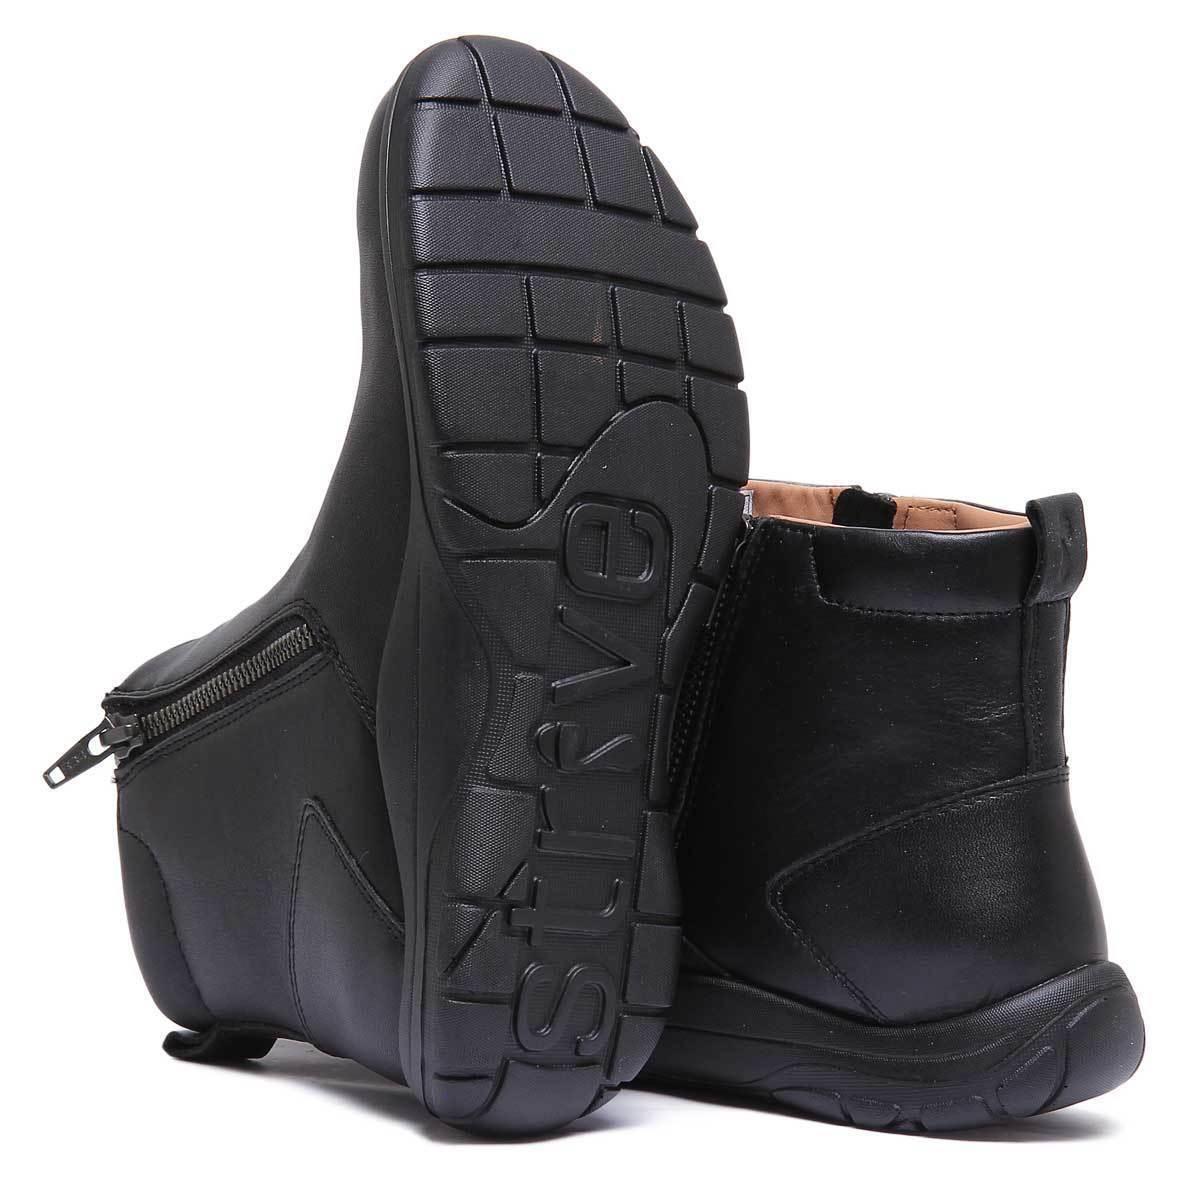 Strive Bamford Femme Cuir Noir Noir Noir Mat Cheville Bottes Taille UK 3 - 8 a7be12